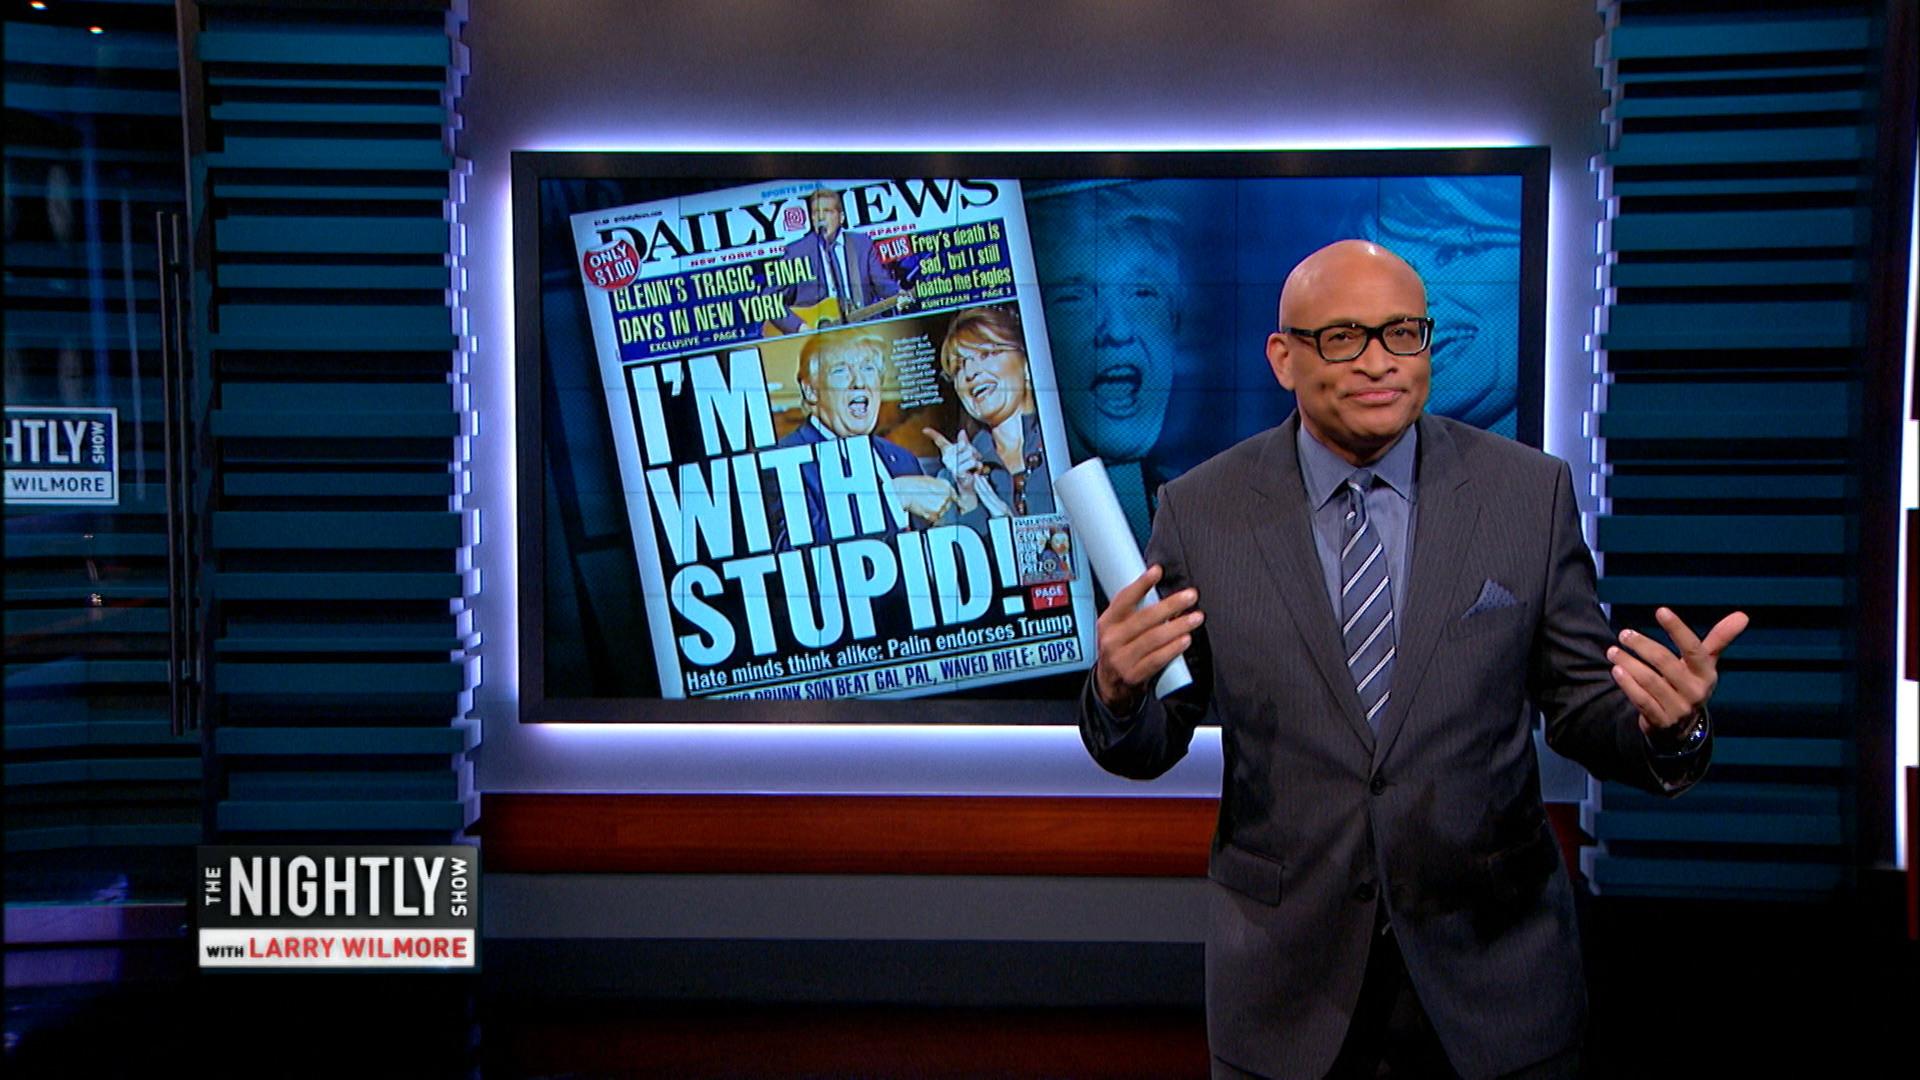 January 20, 2016 - Sarah Palin's Trump Speech & Smart Sex